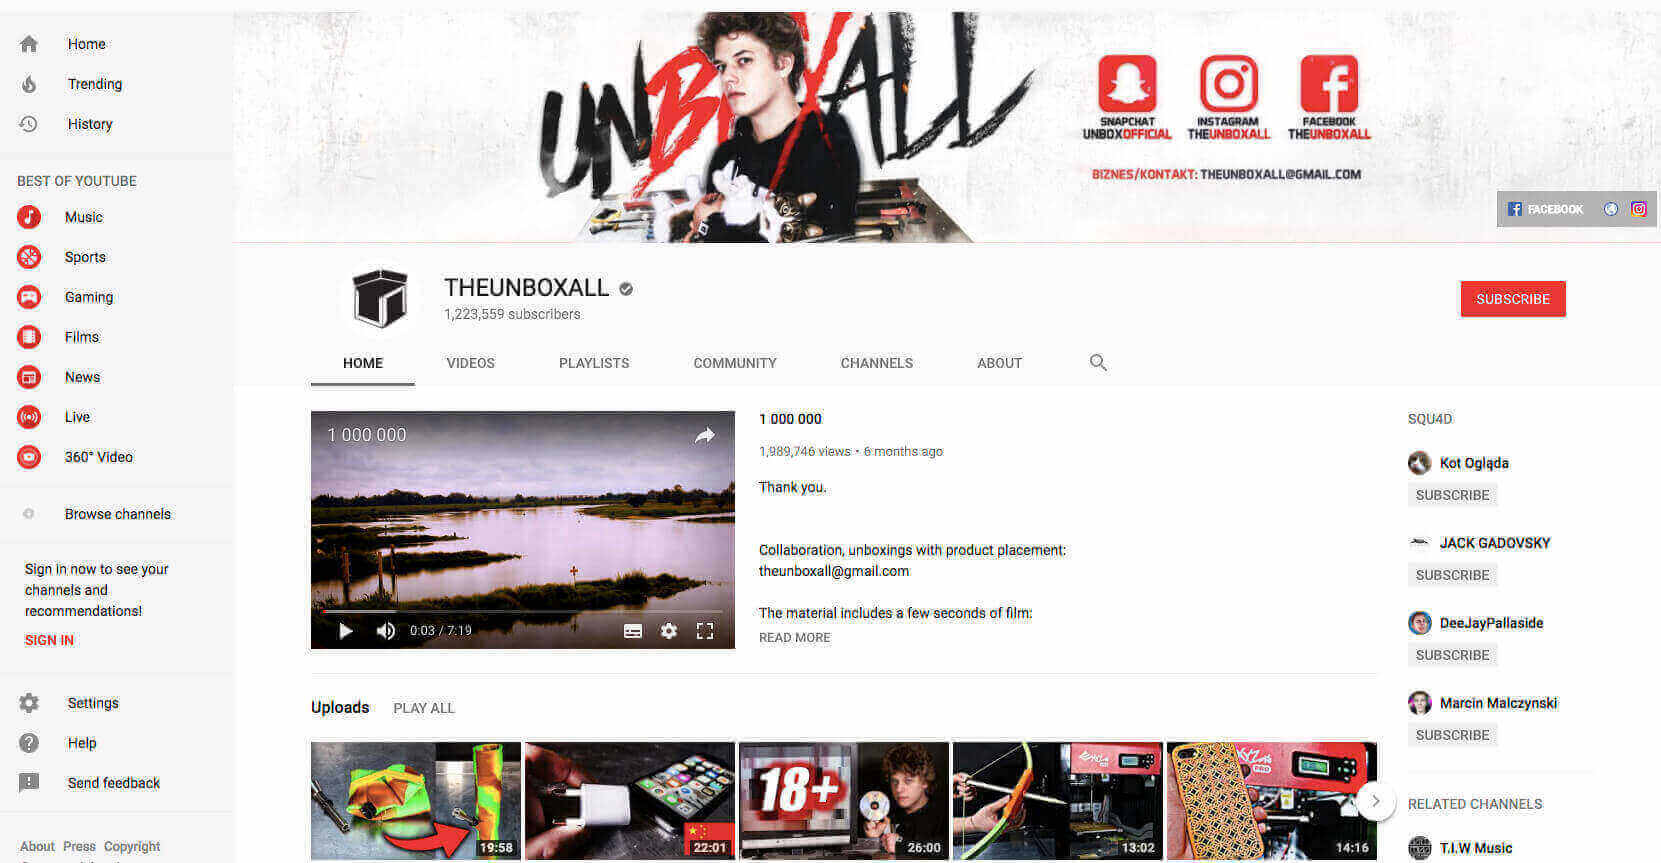 unboxing_unboxall_zapakujto_blogpost